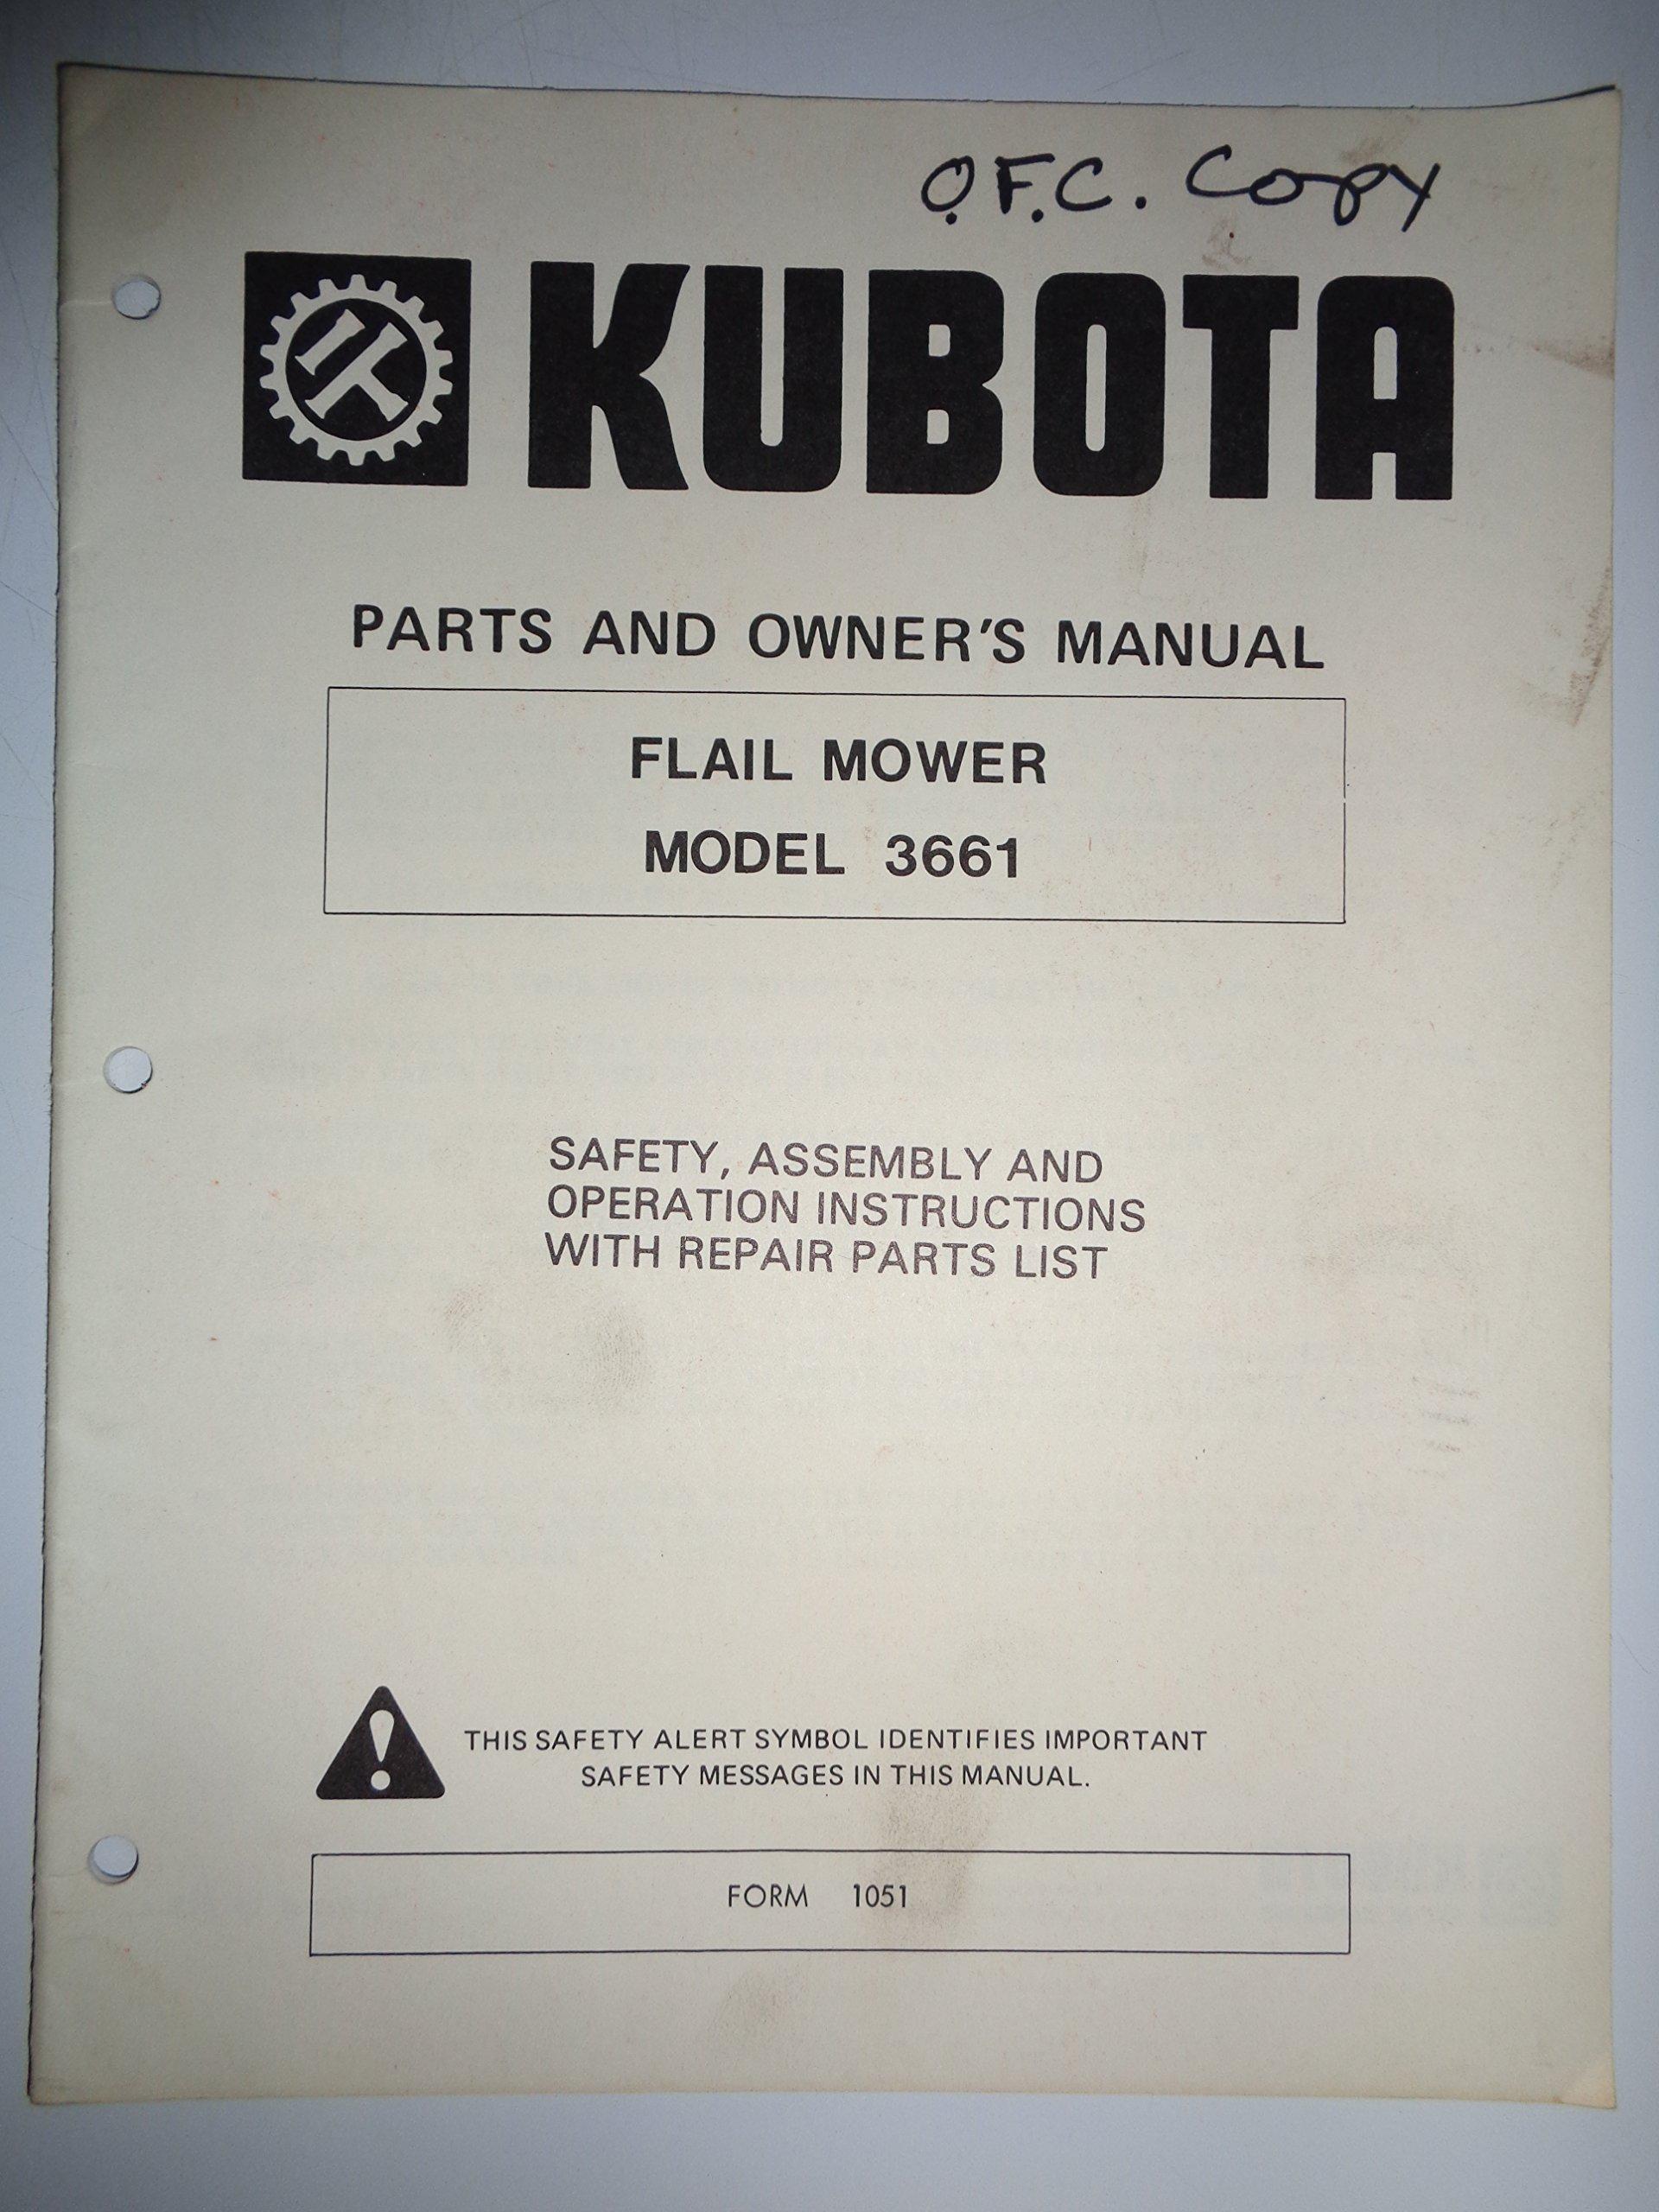 Kubota 3661 Flail Mower (made for use on L185 L245 B7100 B6100 Tractors)  Parts, Operators Manual 9/96: Kubota: Amazon.com: Books